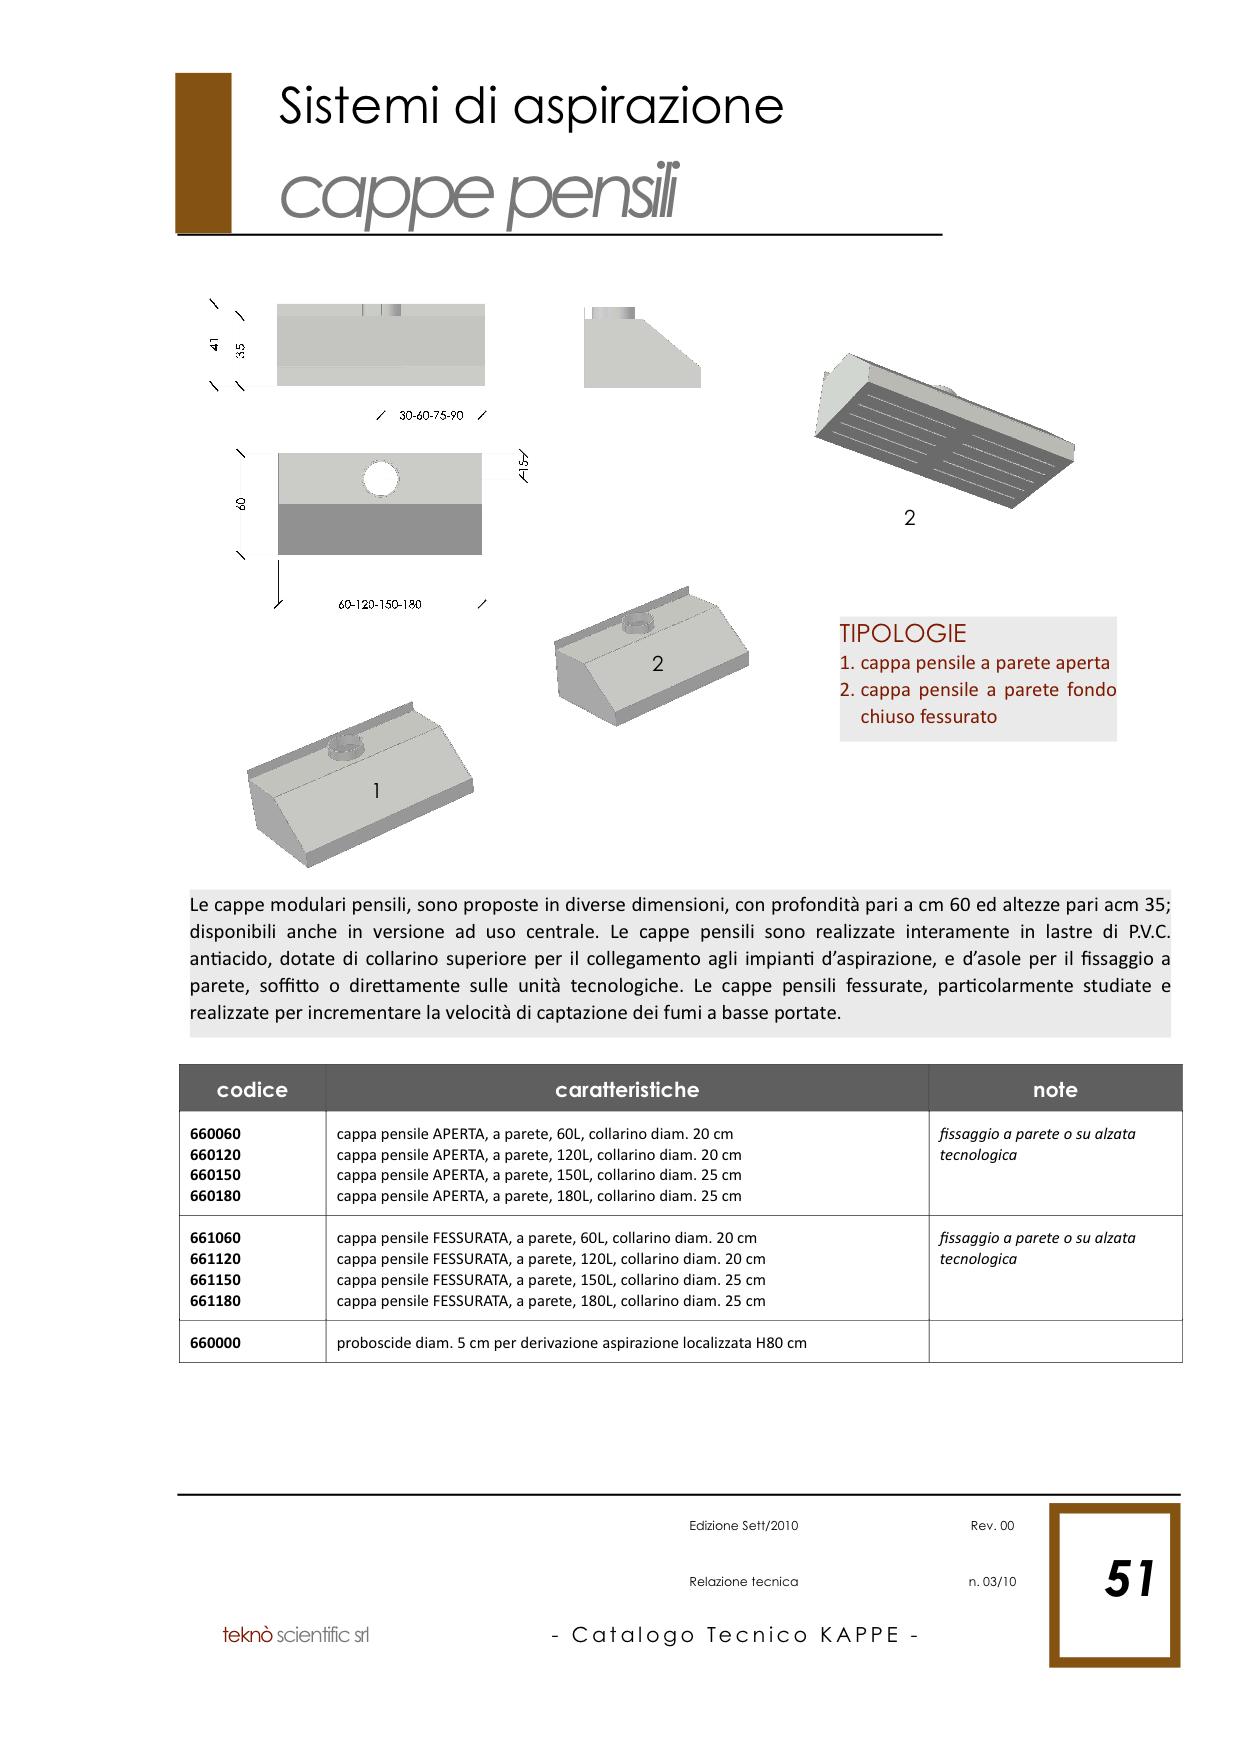 KAPPE Catalogo Tecnico Generale.png